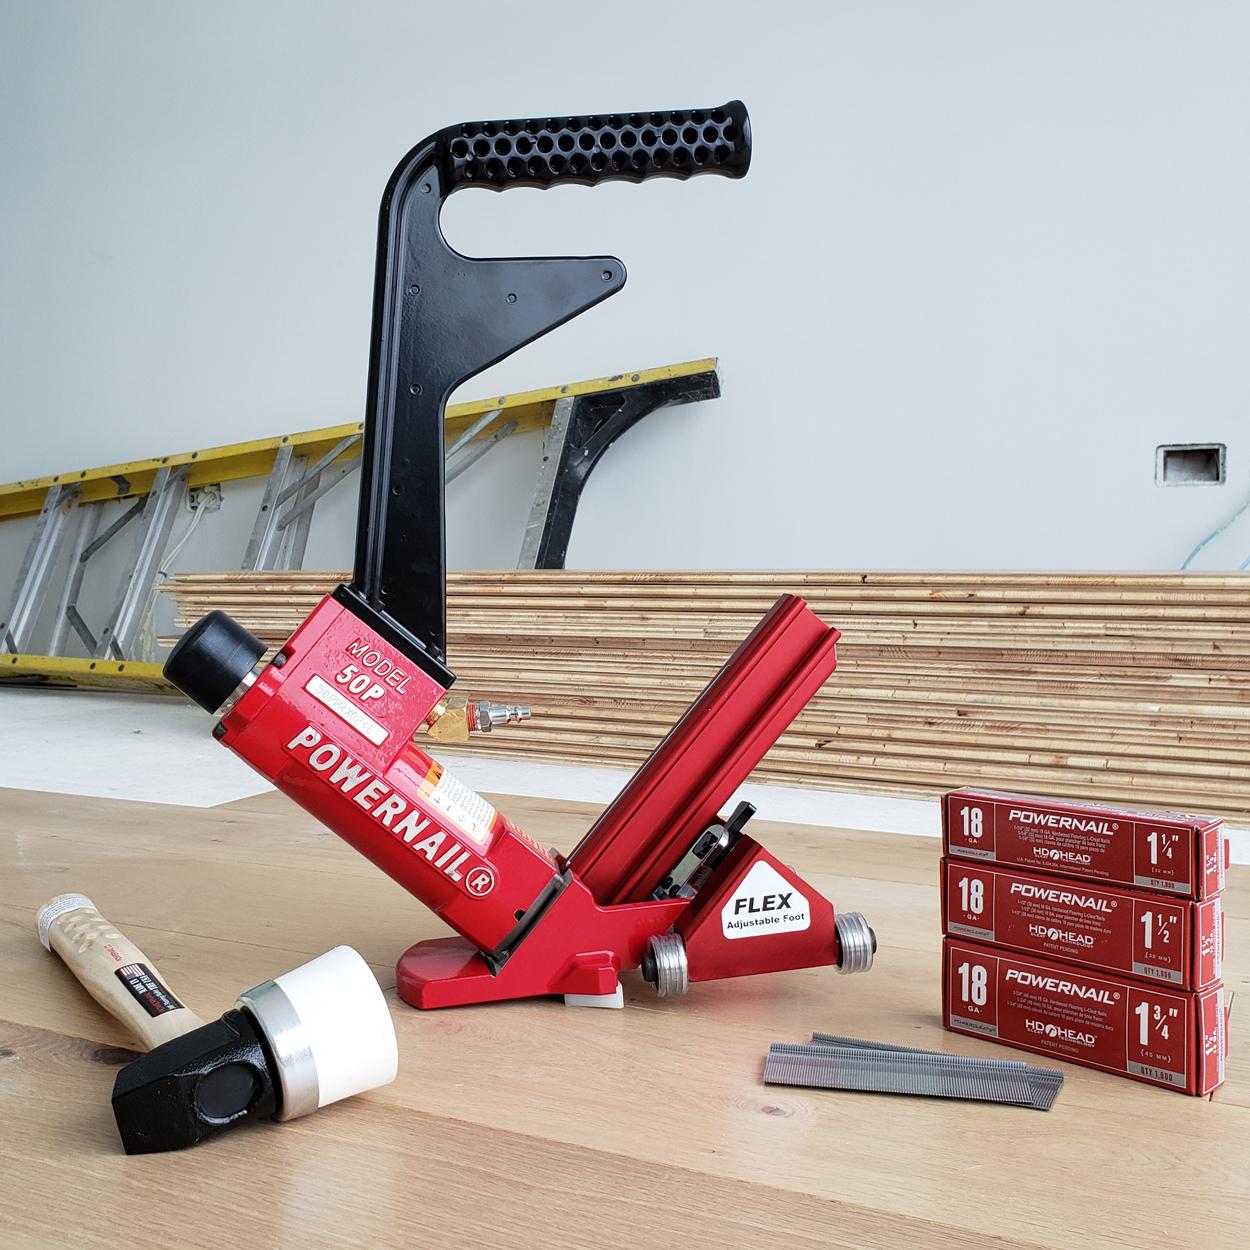 Powernail Model 50P FLEX Power Roller18-Gauge Pneumatic Hardwood Flooring Nailer